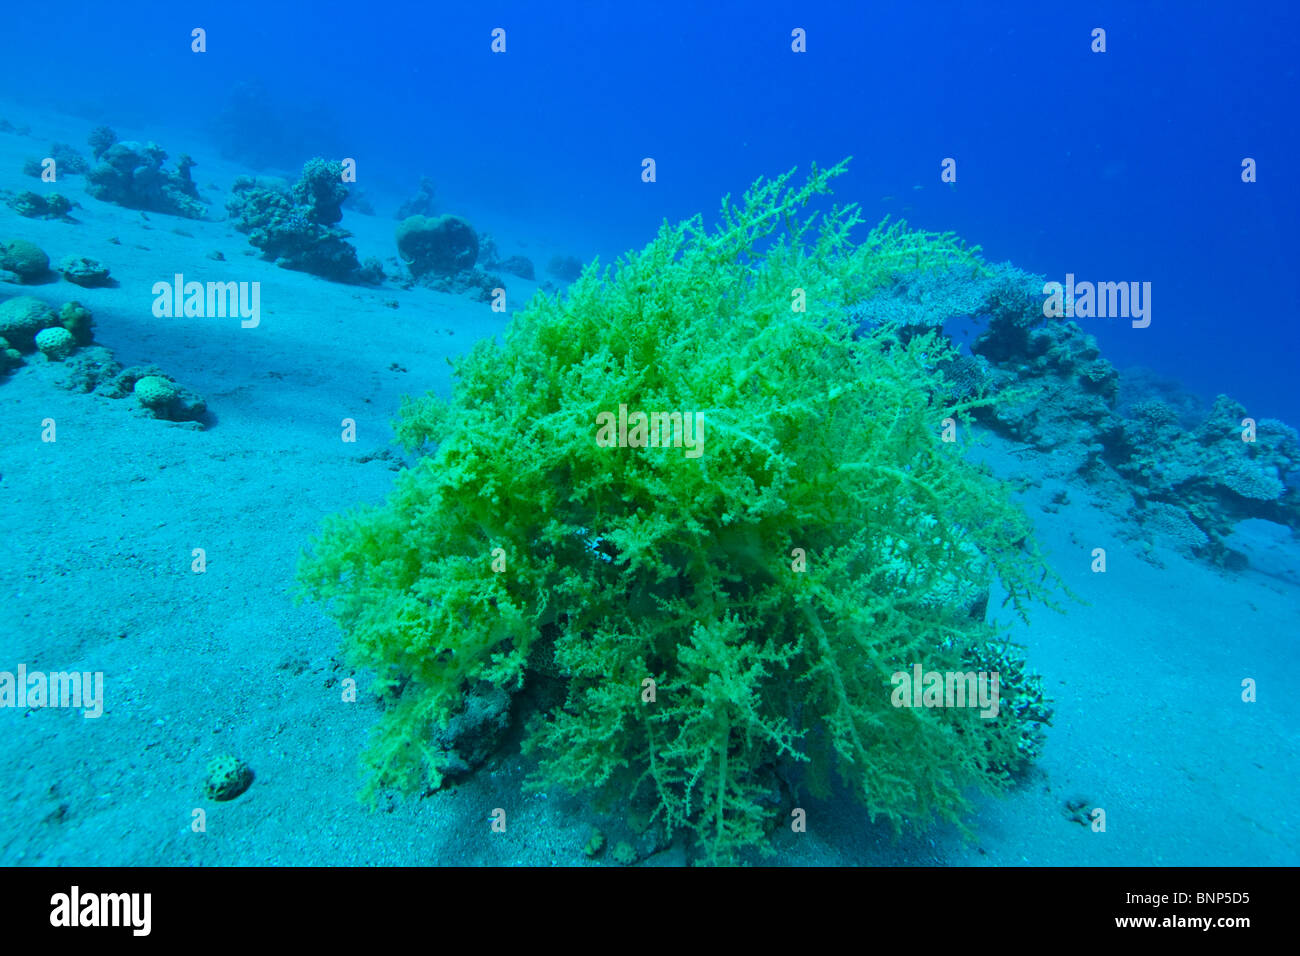 Litophyton arboreum - Stock Image